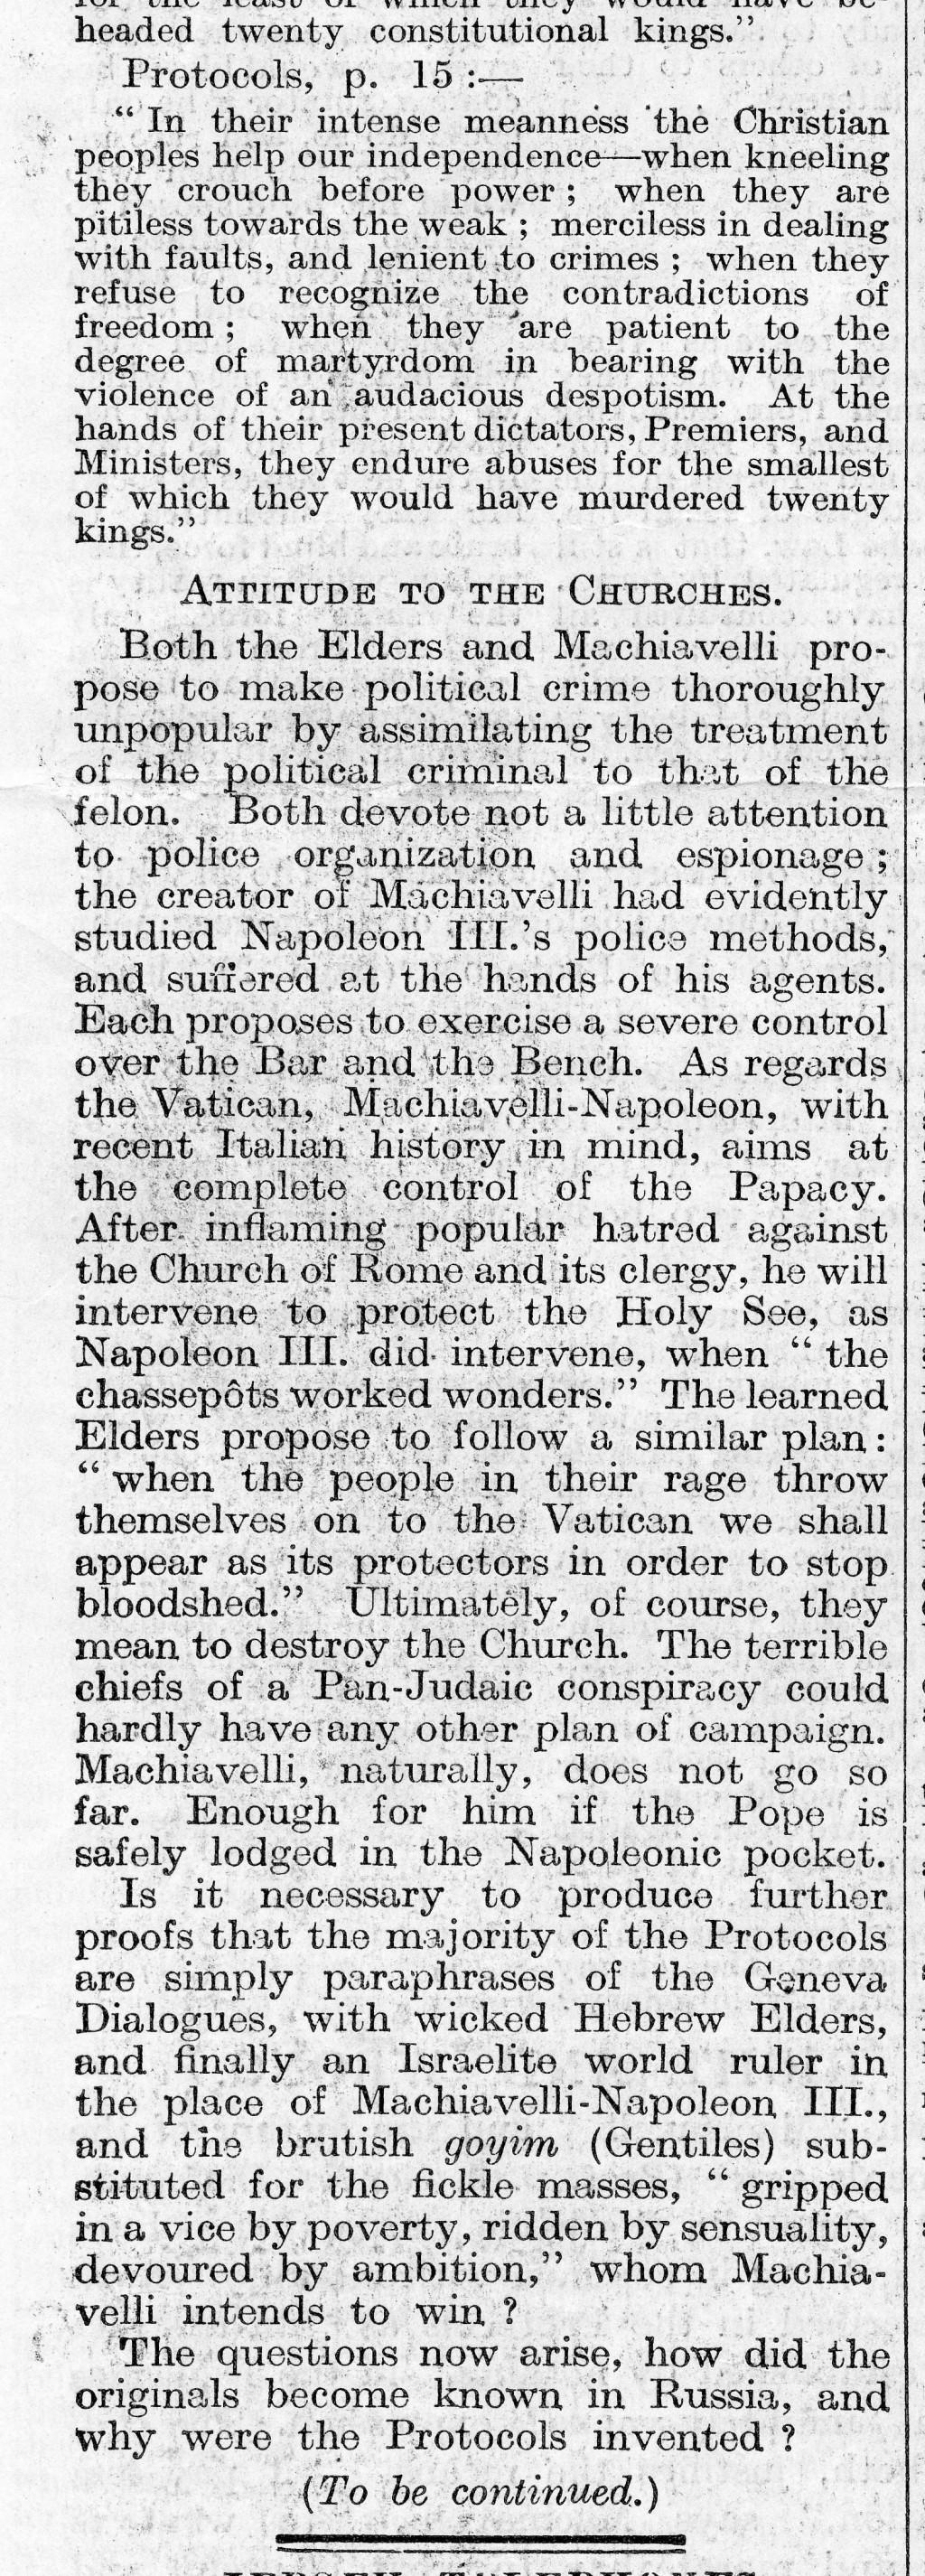 The Times, August 17, 1921 [LCID: 2006u83u]